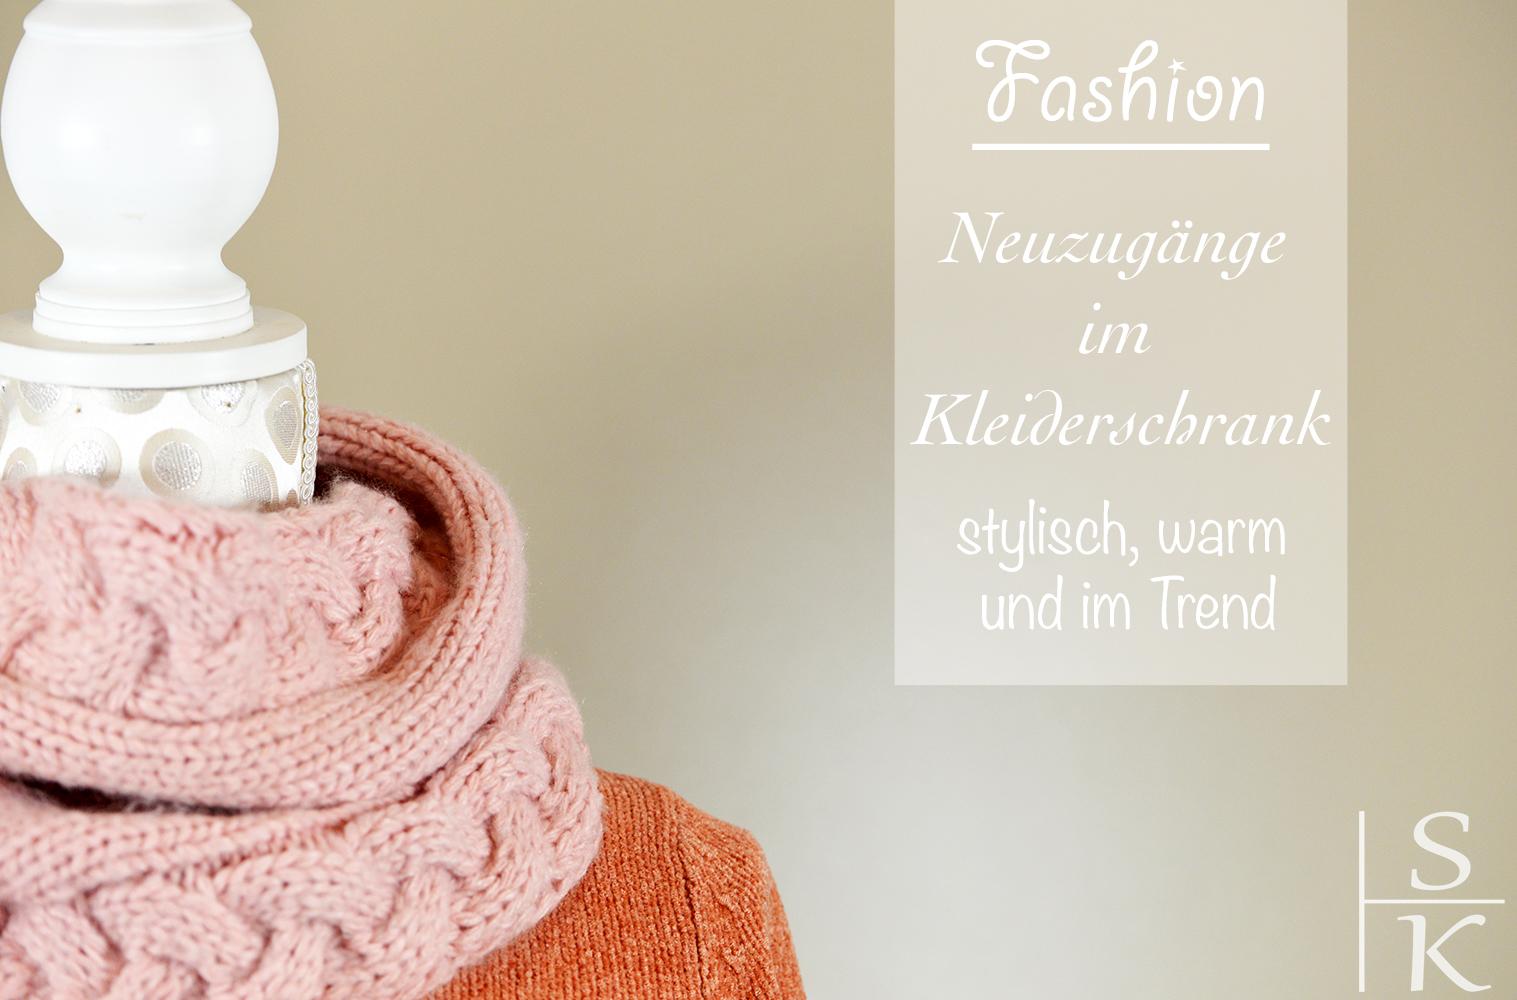 Neu im Kleiderschrank #1 @Saskia-Katharina Most, Horizont-Blog